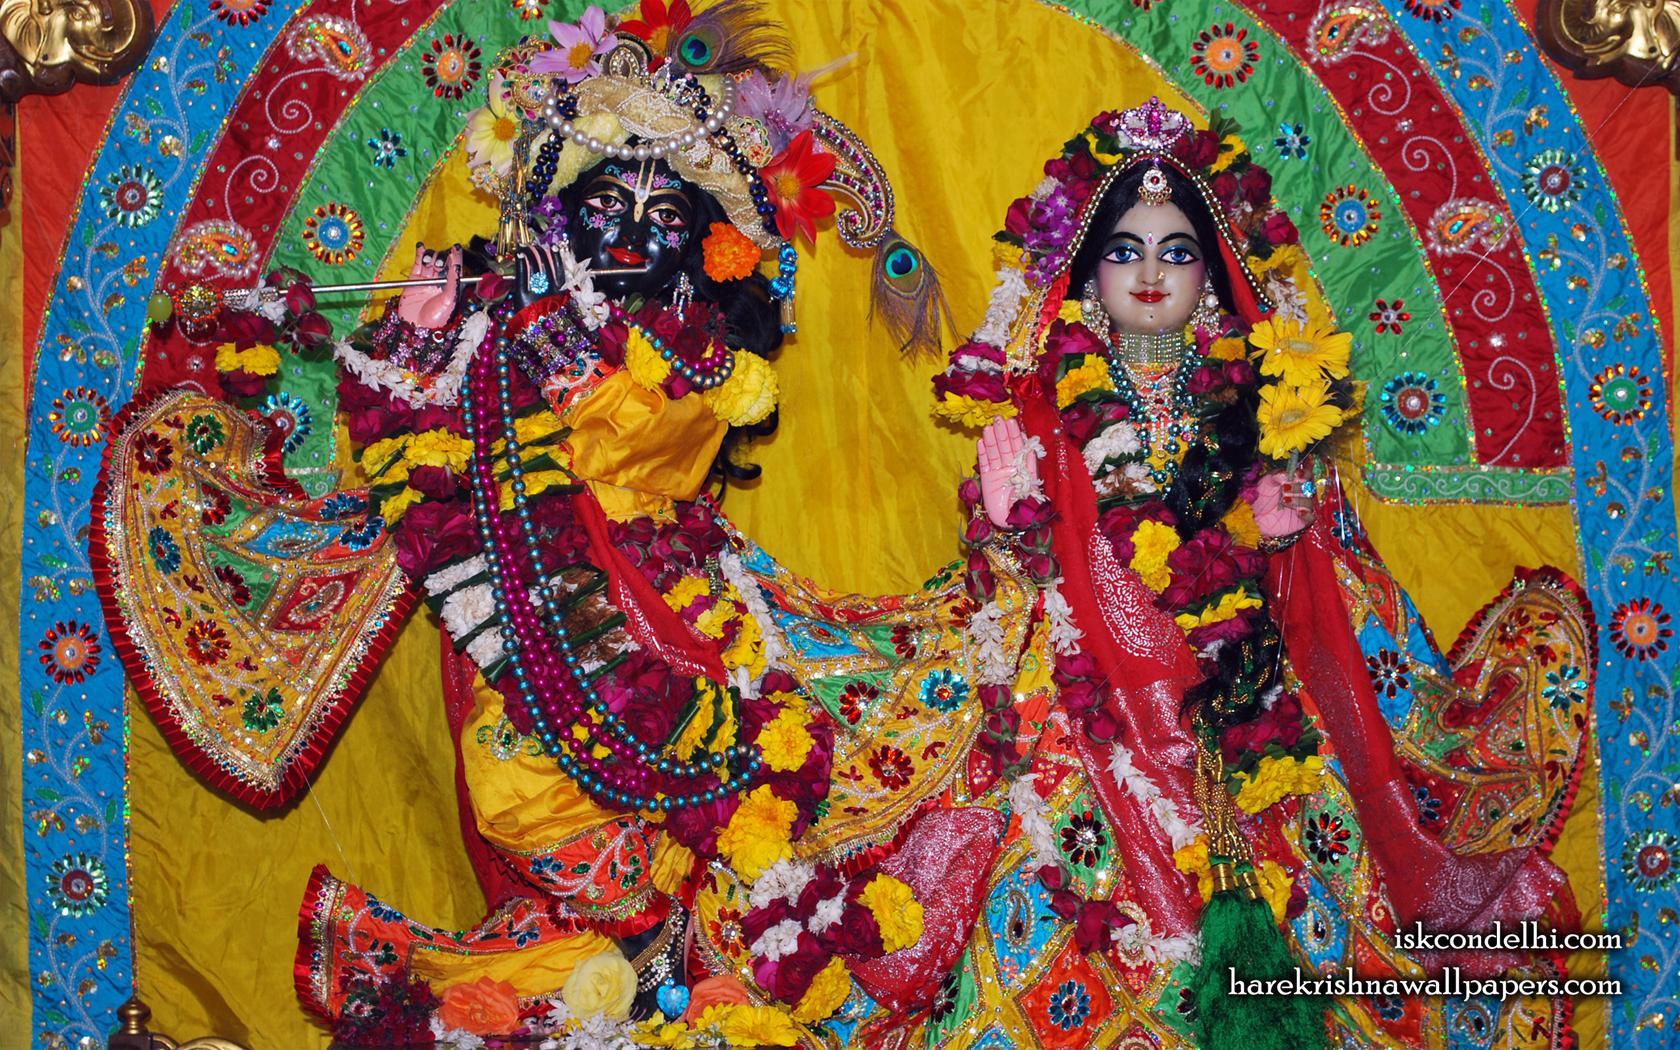 Sri Sri Radha Parthasarathi Wallpaper (011) Size 1680x1050 Download